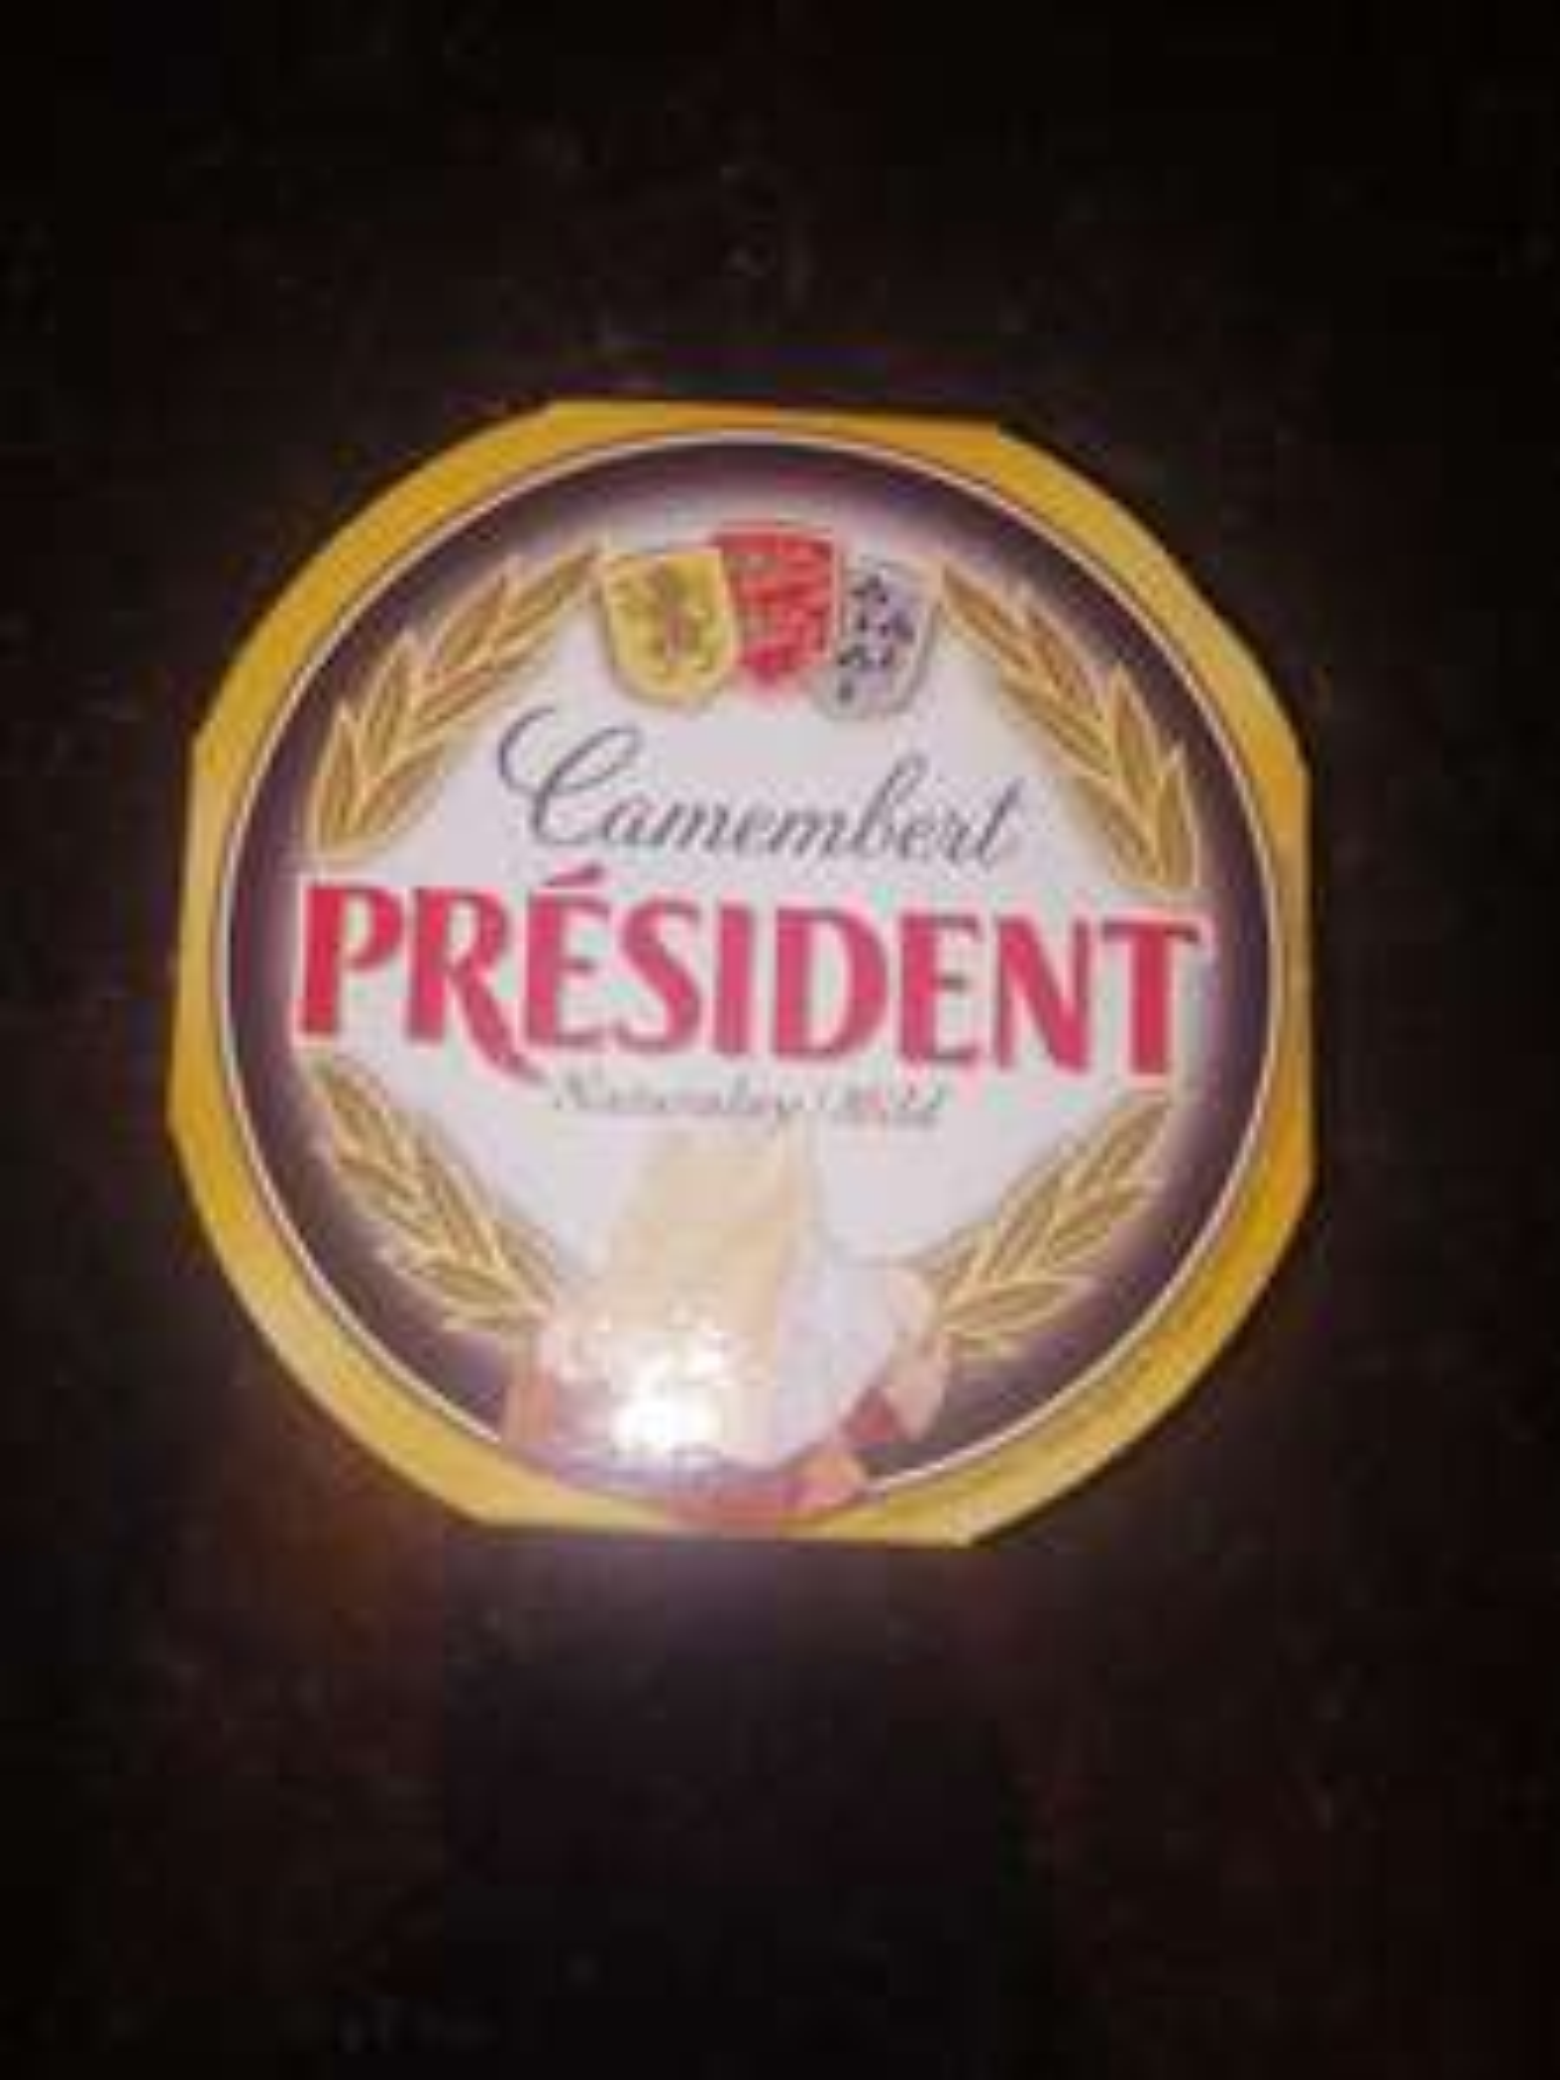 President camebert 120g 50p in poundland huddersfield